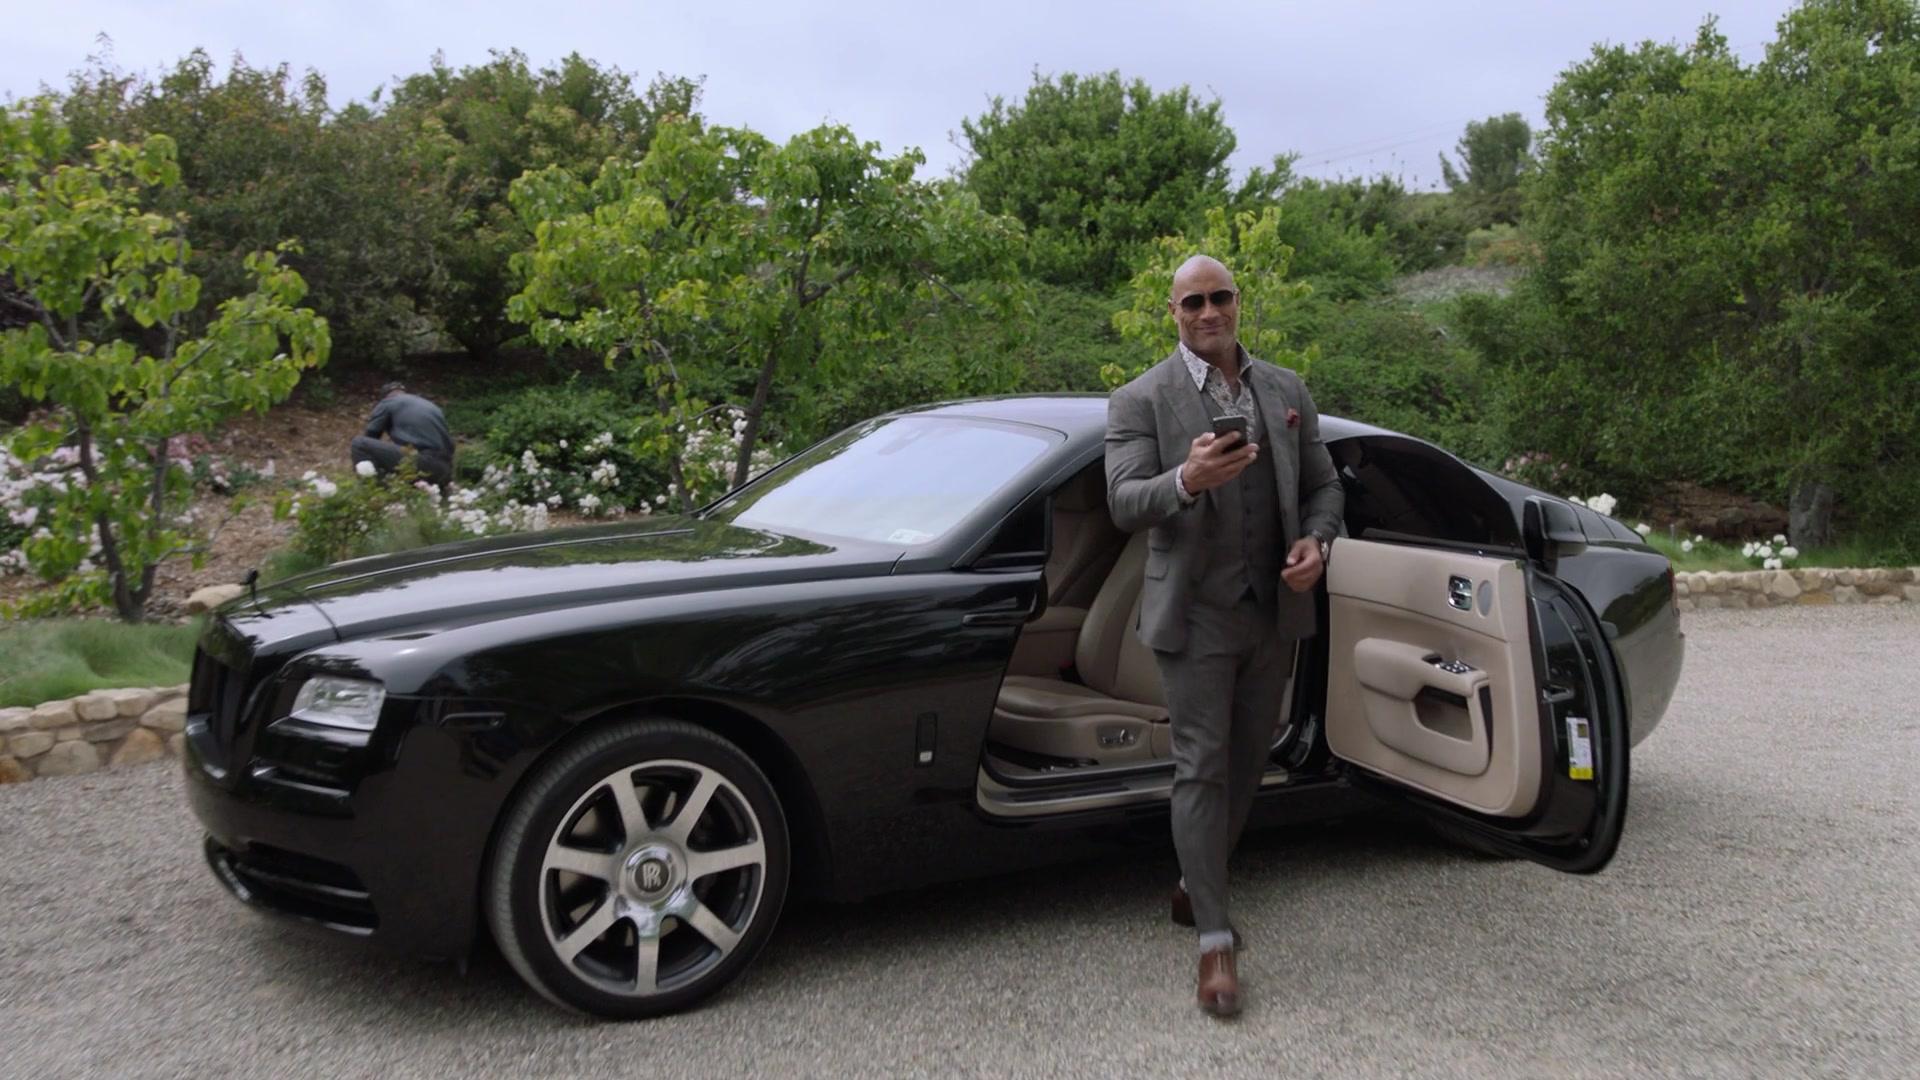 Rolls Royce Wraith Black Car Used By Dwayne Johnson As